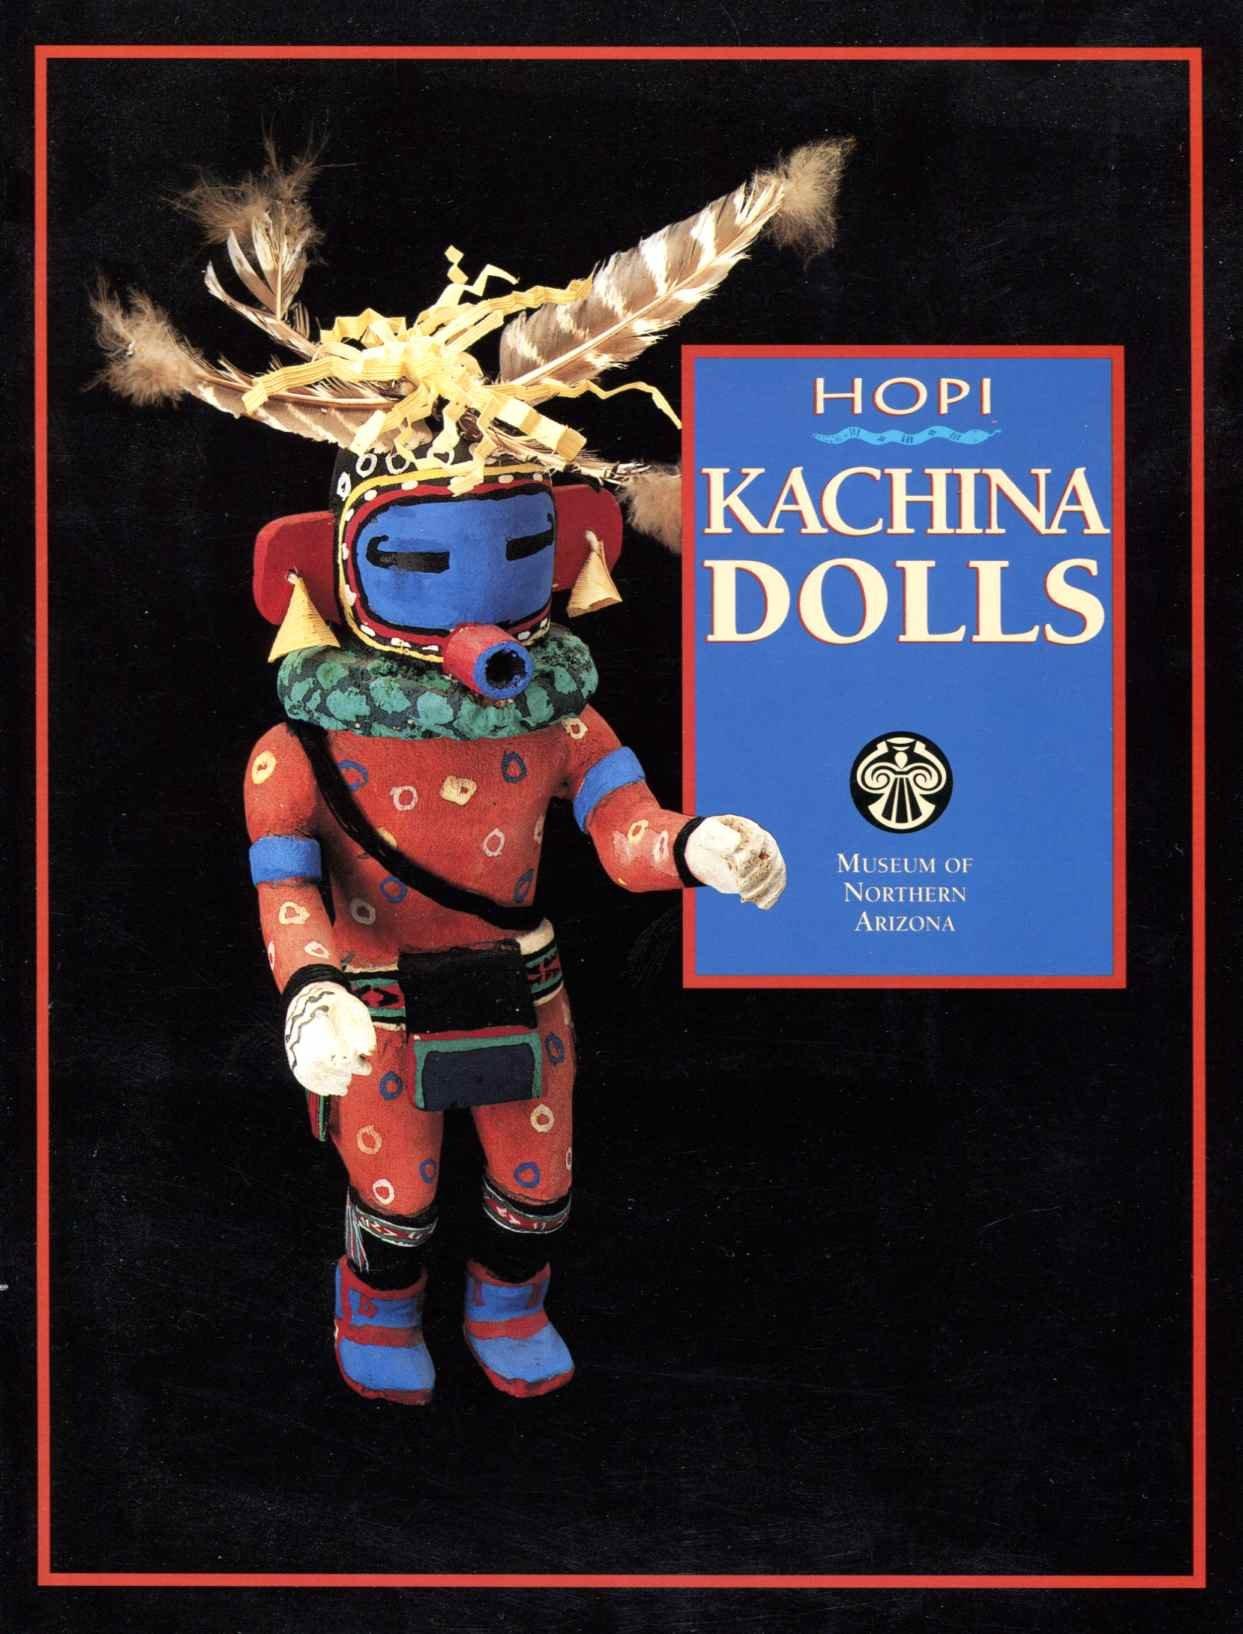 Hopi Kachina Dolls (Plateau, Vol 63 No 4)